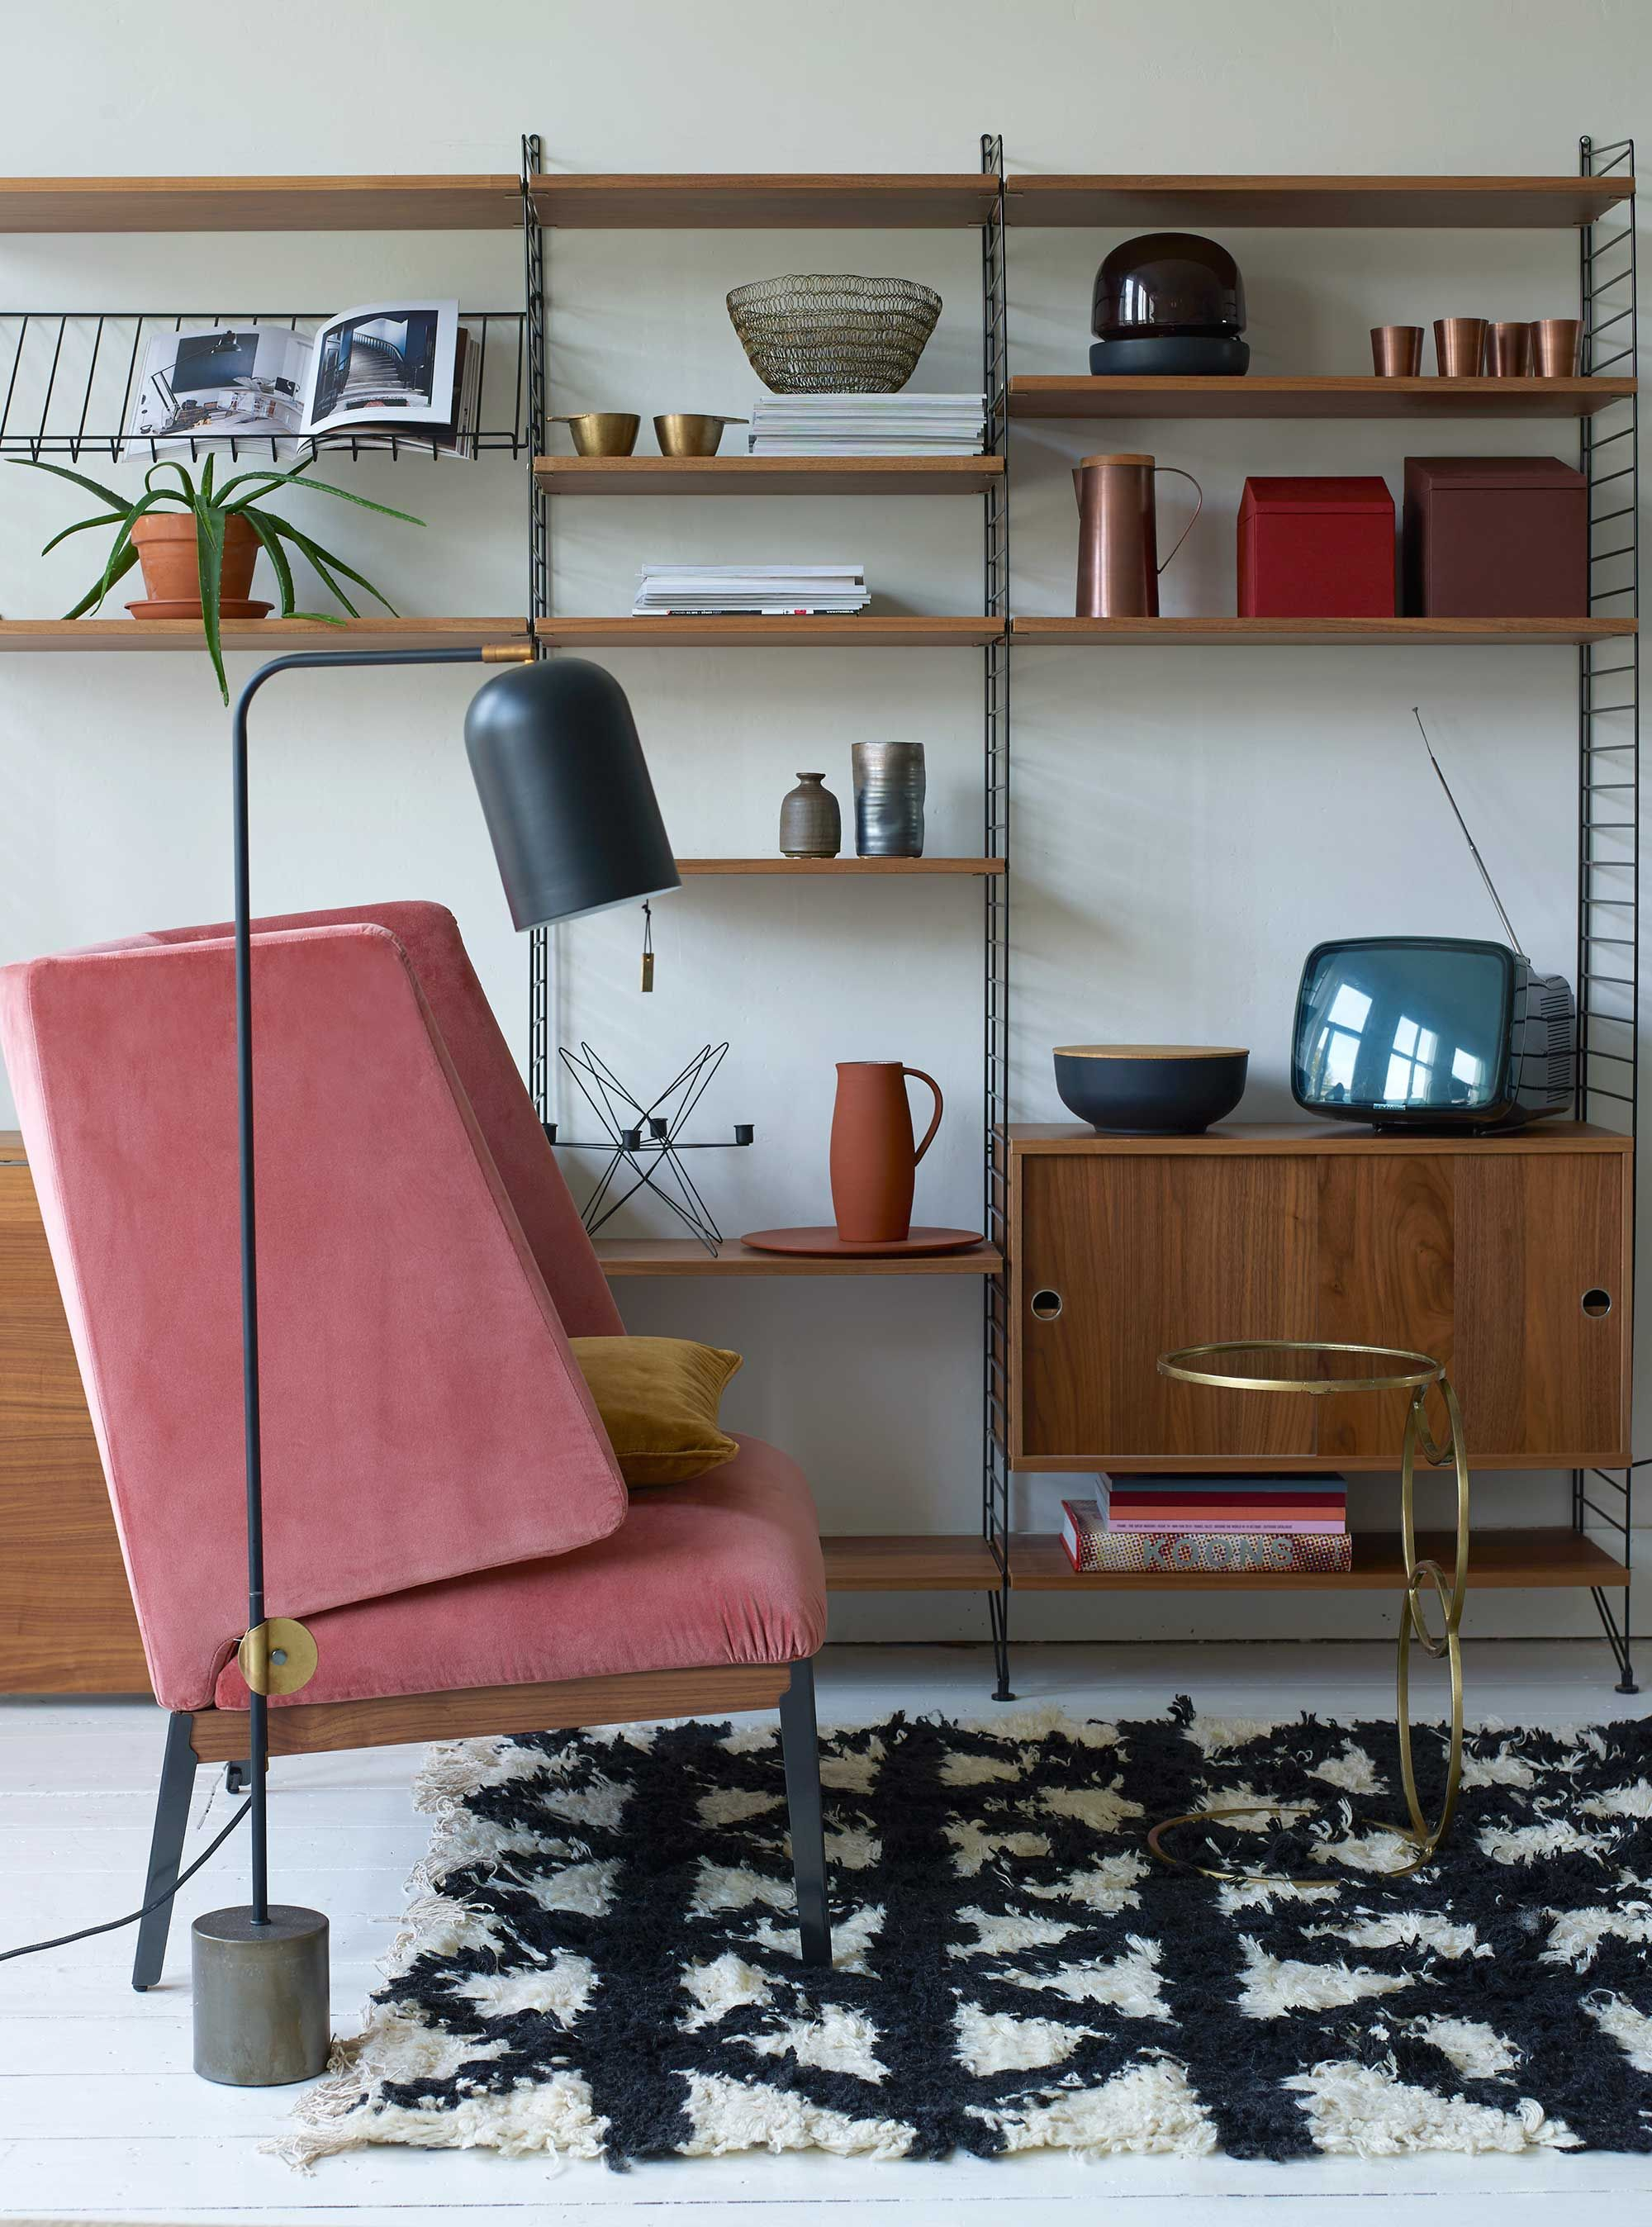 Woonkamer met roze stoel | living room with pink chair | vtwonen 01 ...